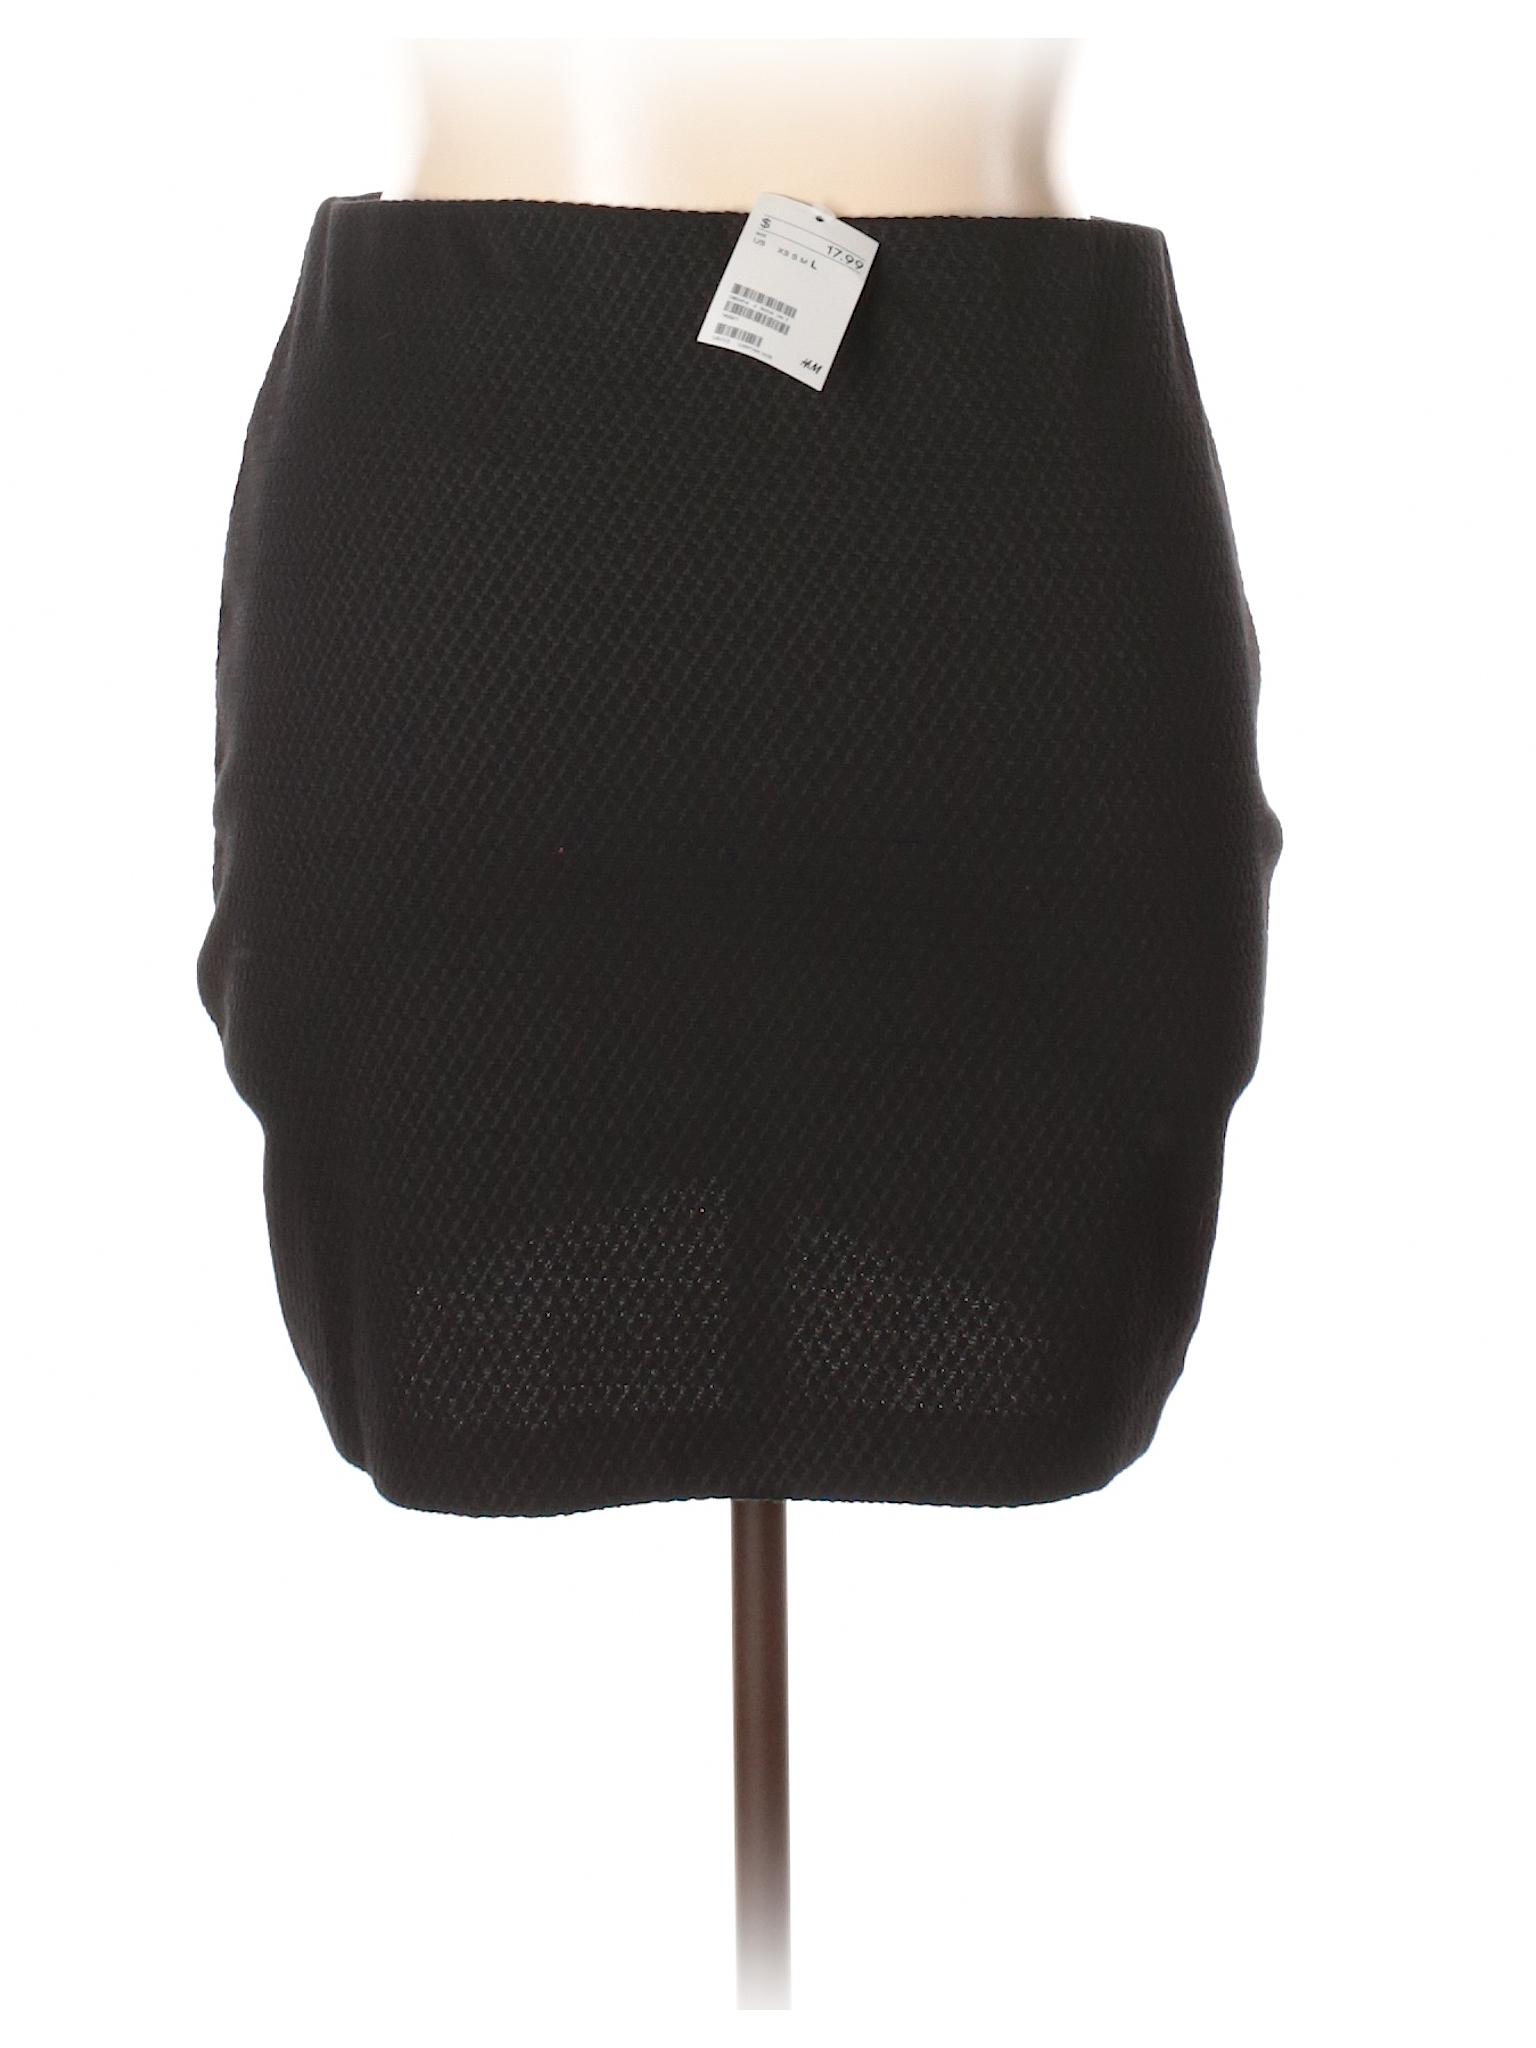 Boutique leisure Skirt Casual amp;M H FFAwxrqOR